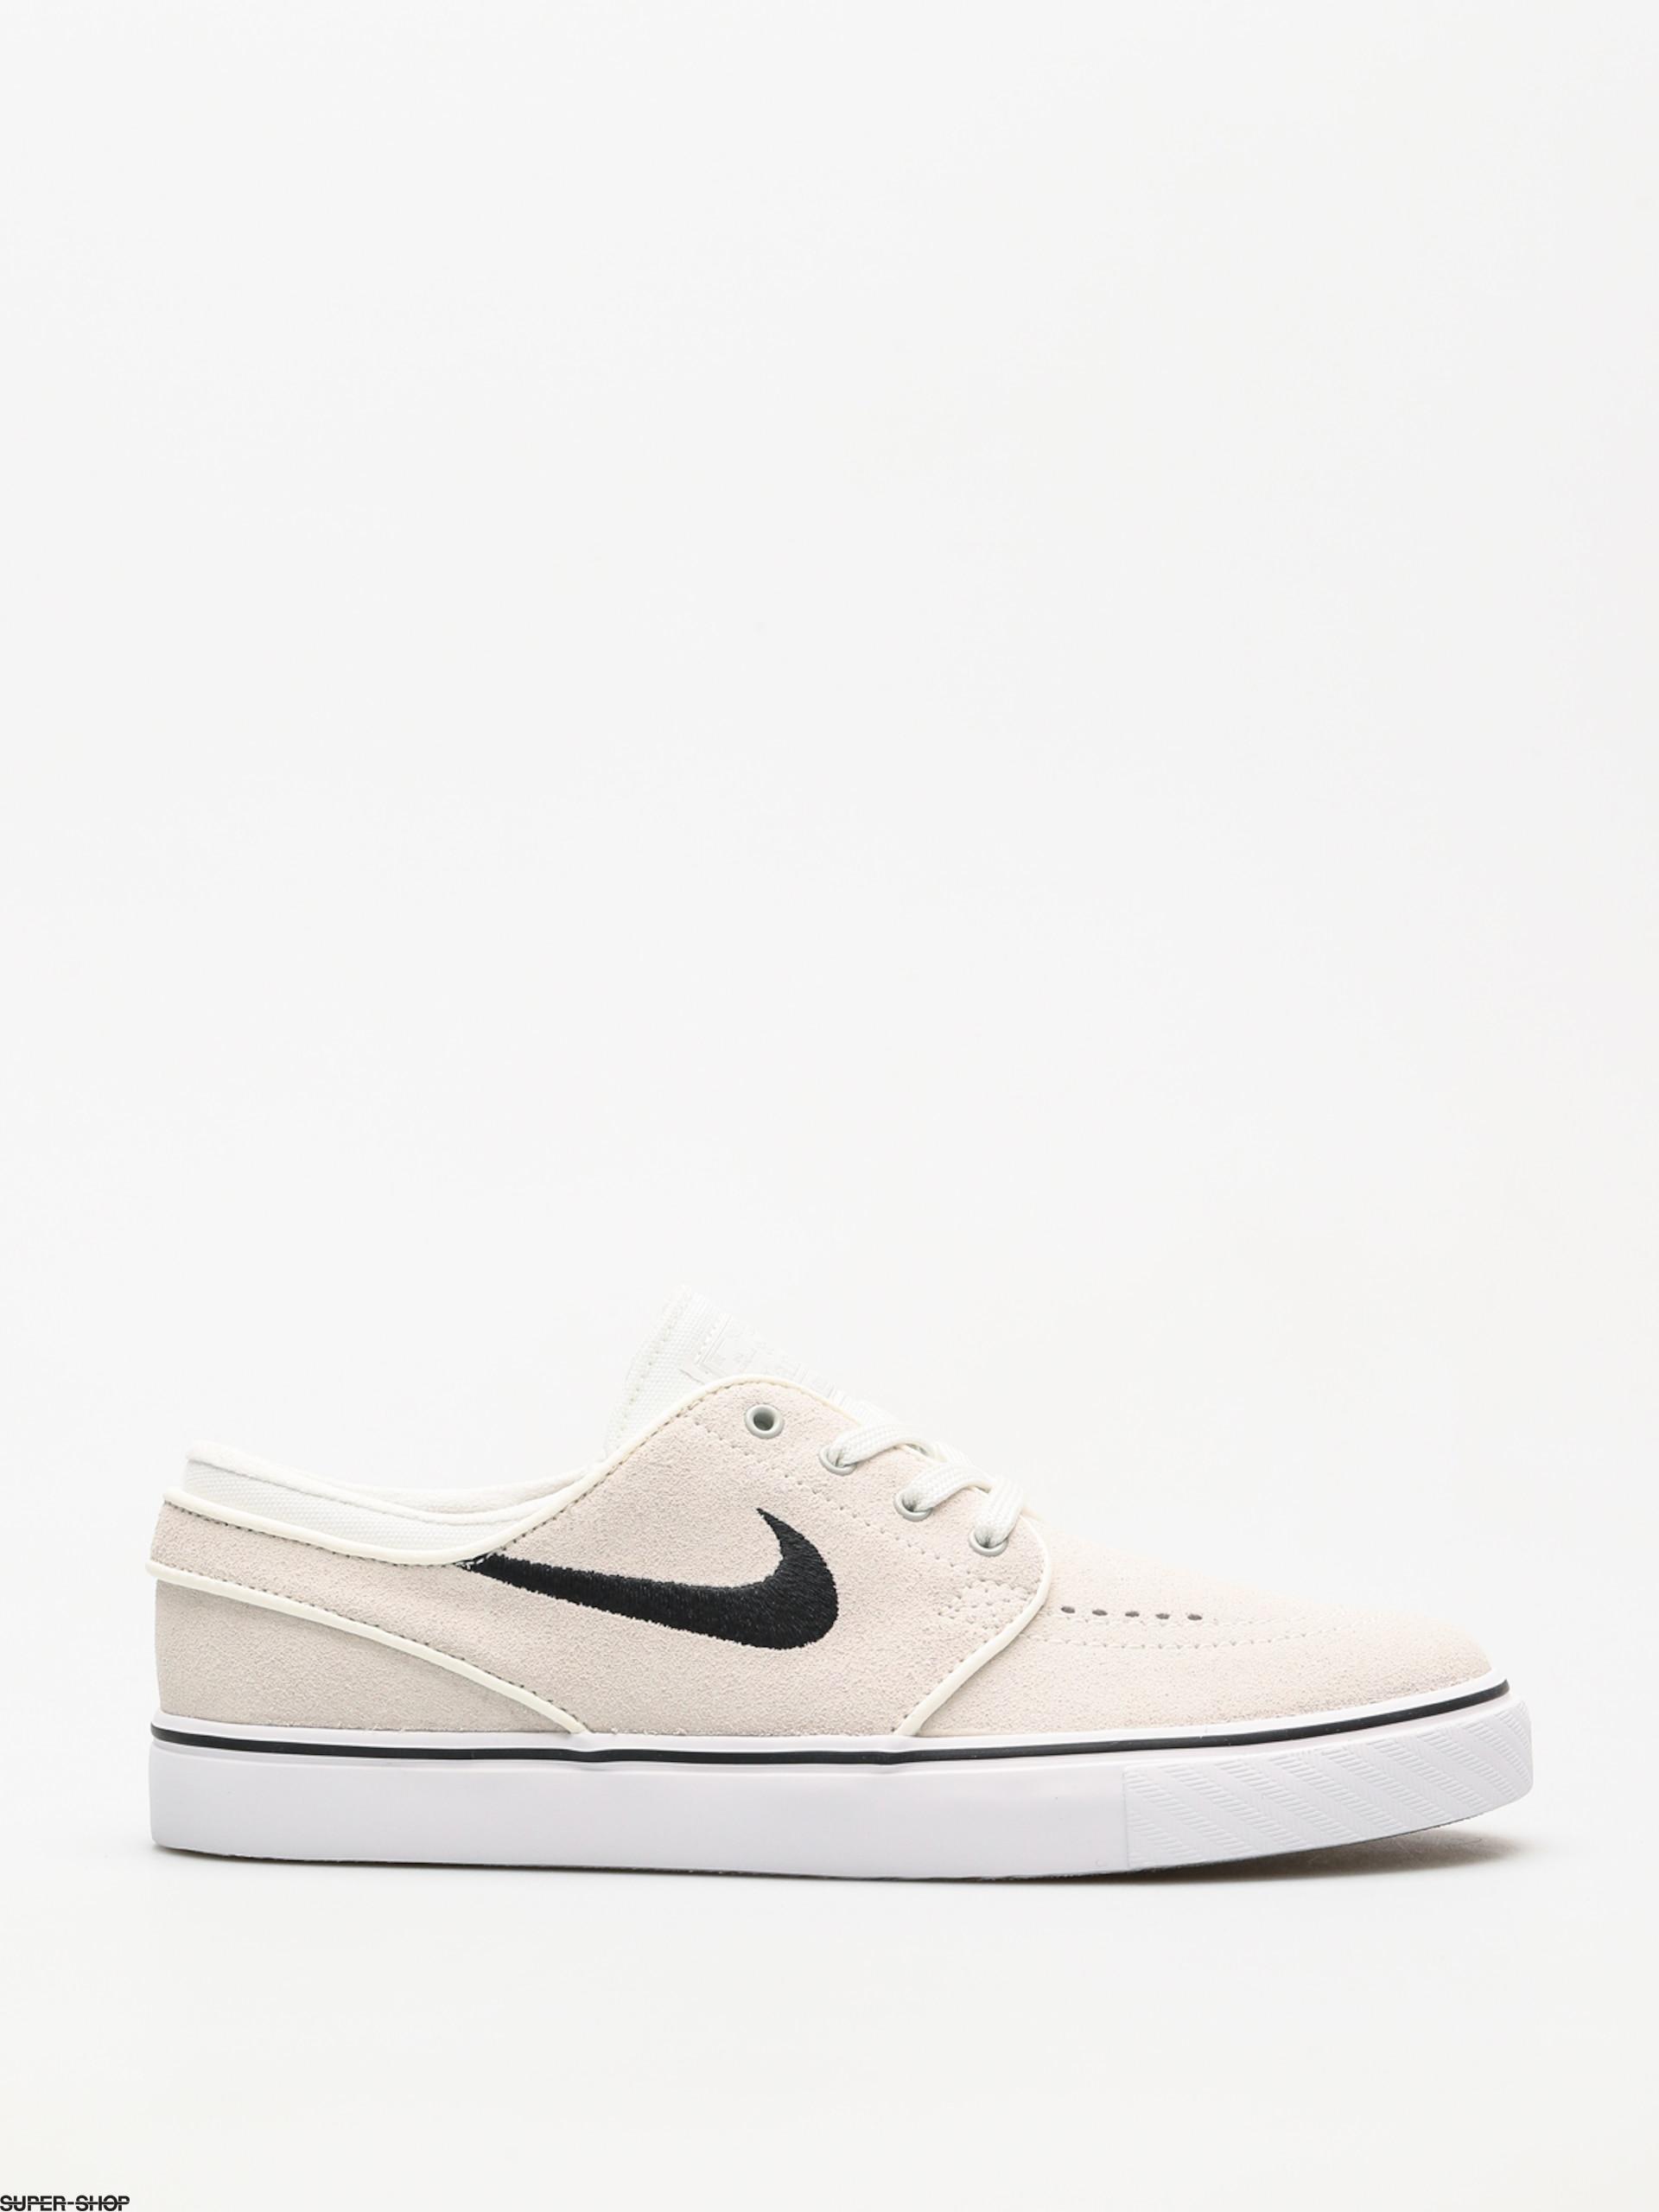 reputable site 6197a e5f5e Nike SB Shoes Zoom Stefan Janoski (summit white black pure platinum)